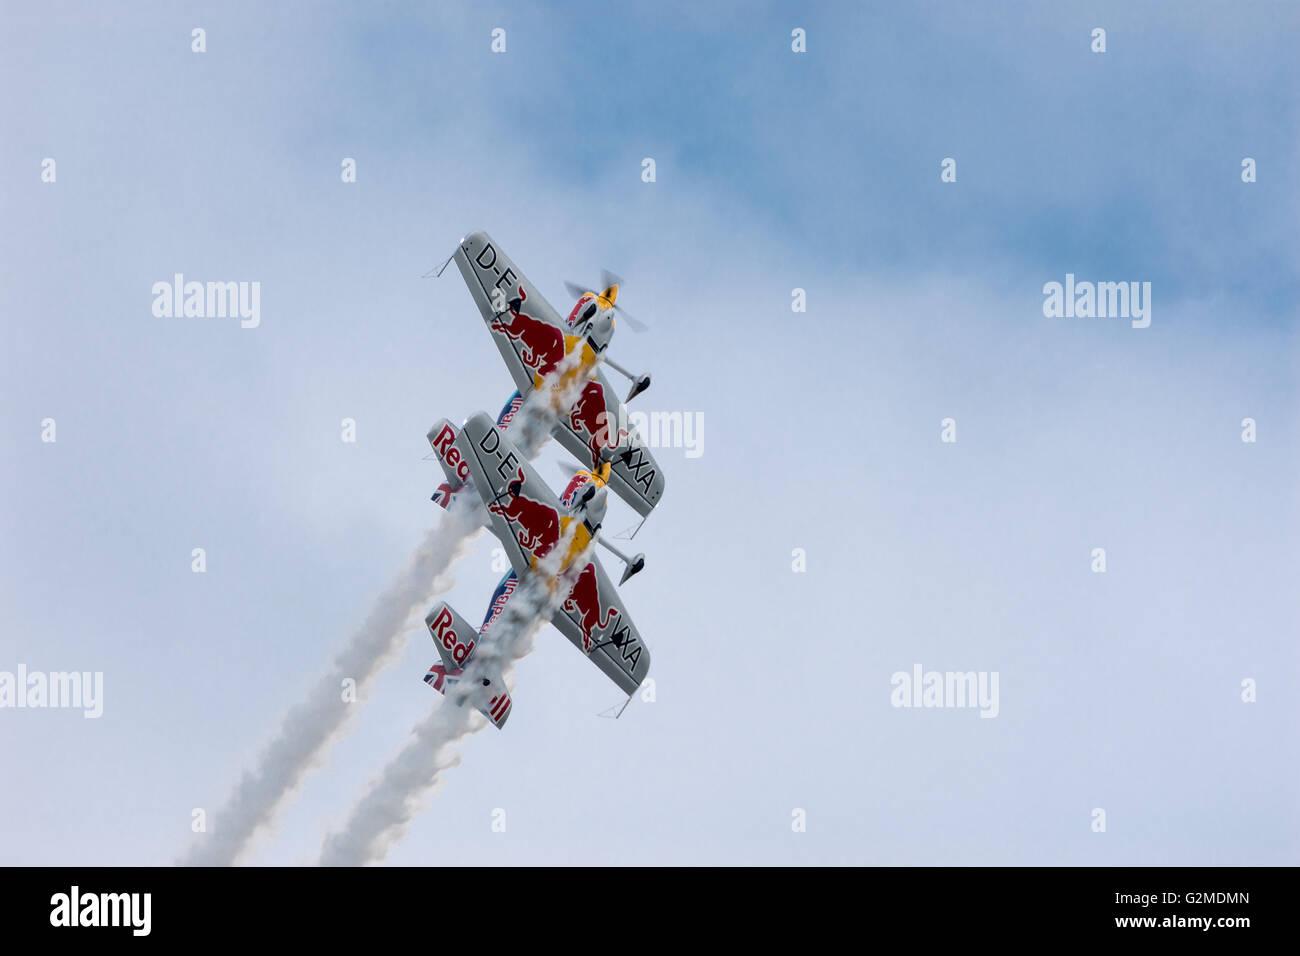 Redbull Display Team Duxford American Airshow May 2016 - Stock Image